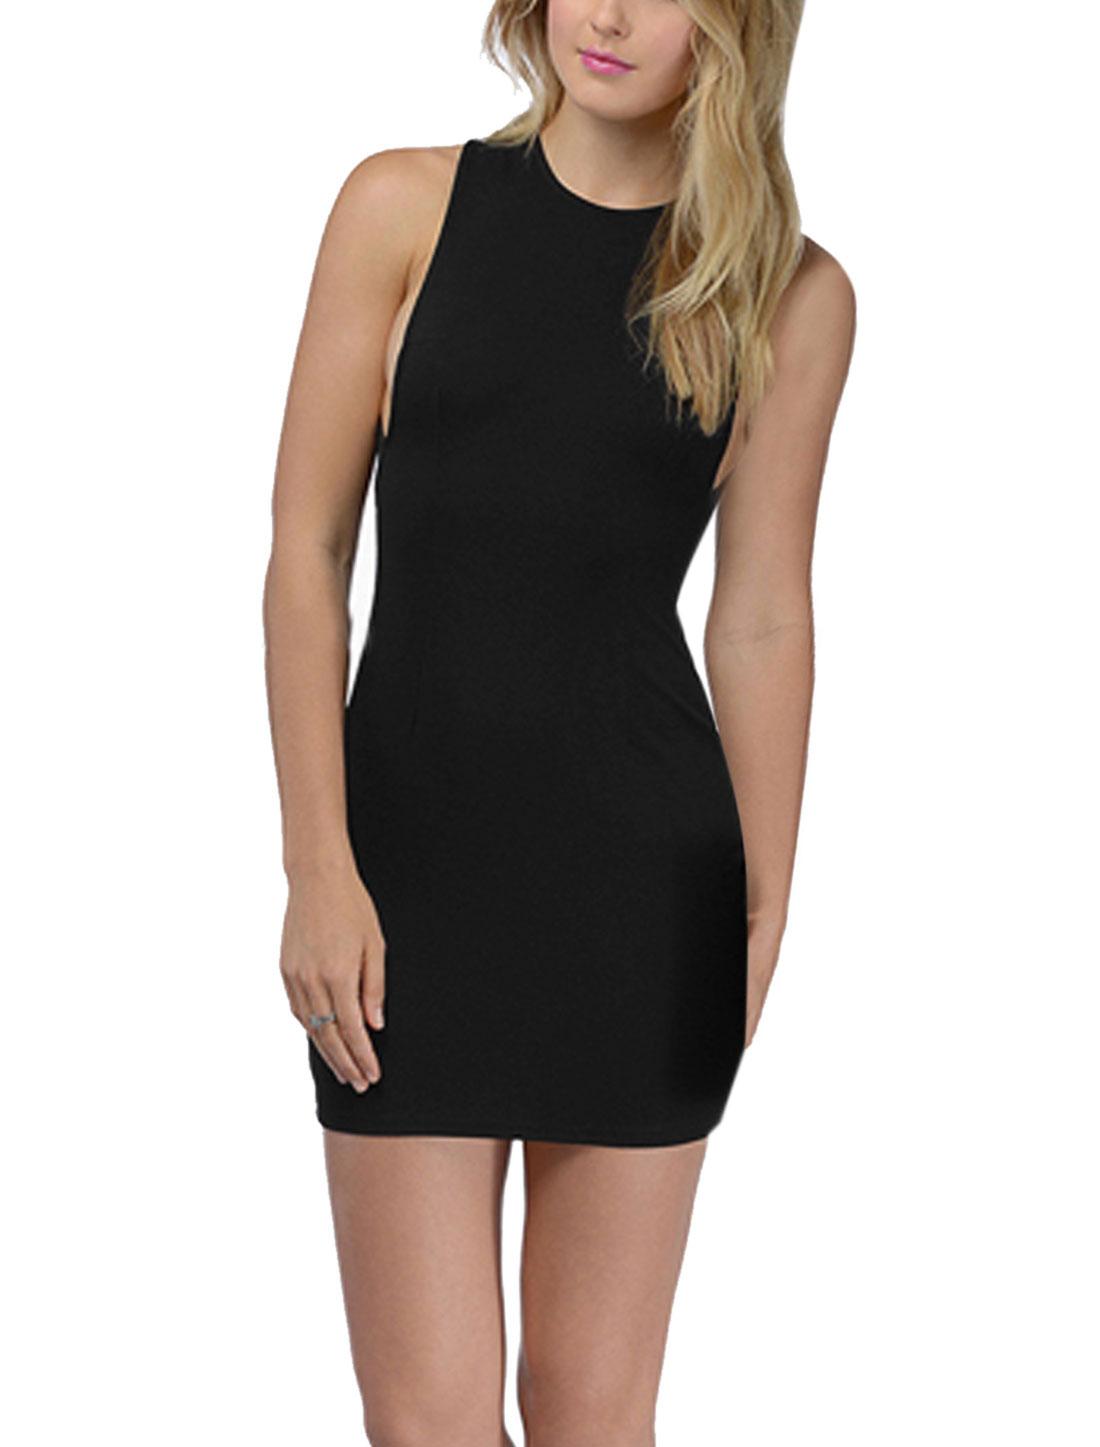 Lady Halter Neck Multi Straps Back Unlined Mini Dress Black M